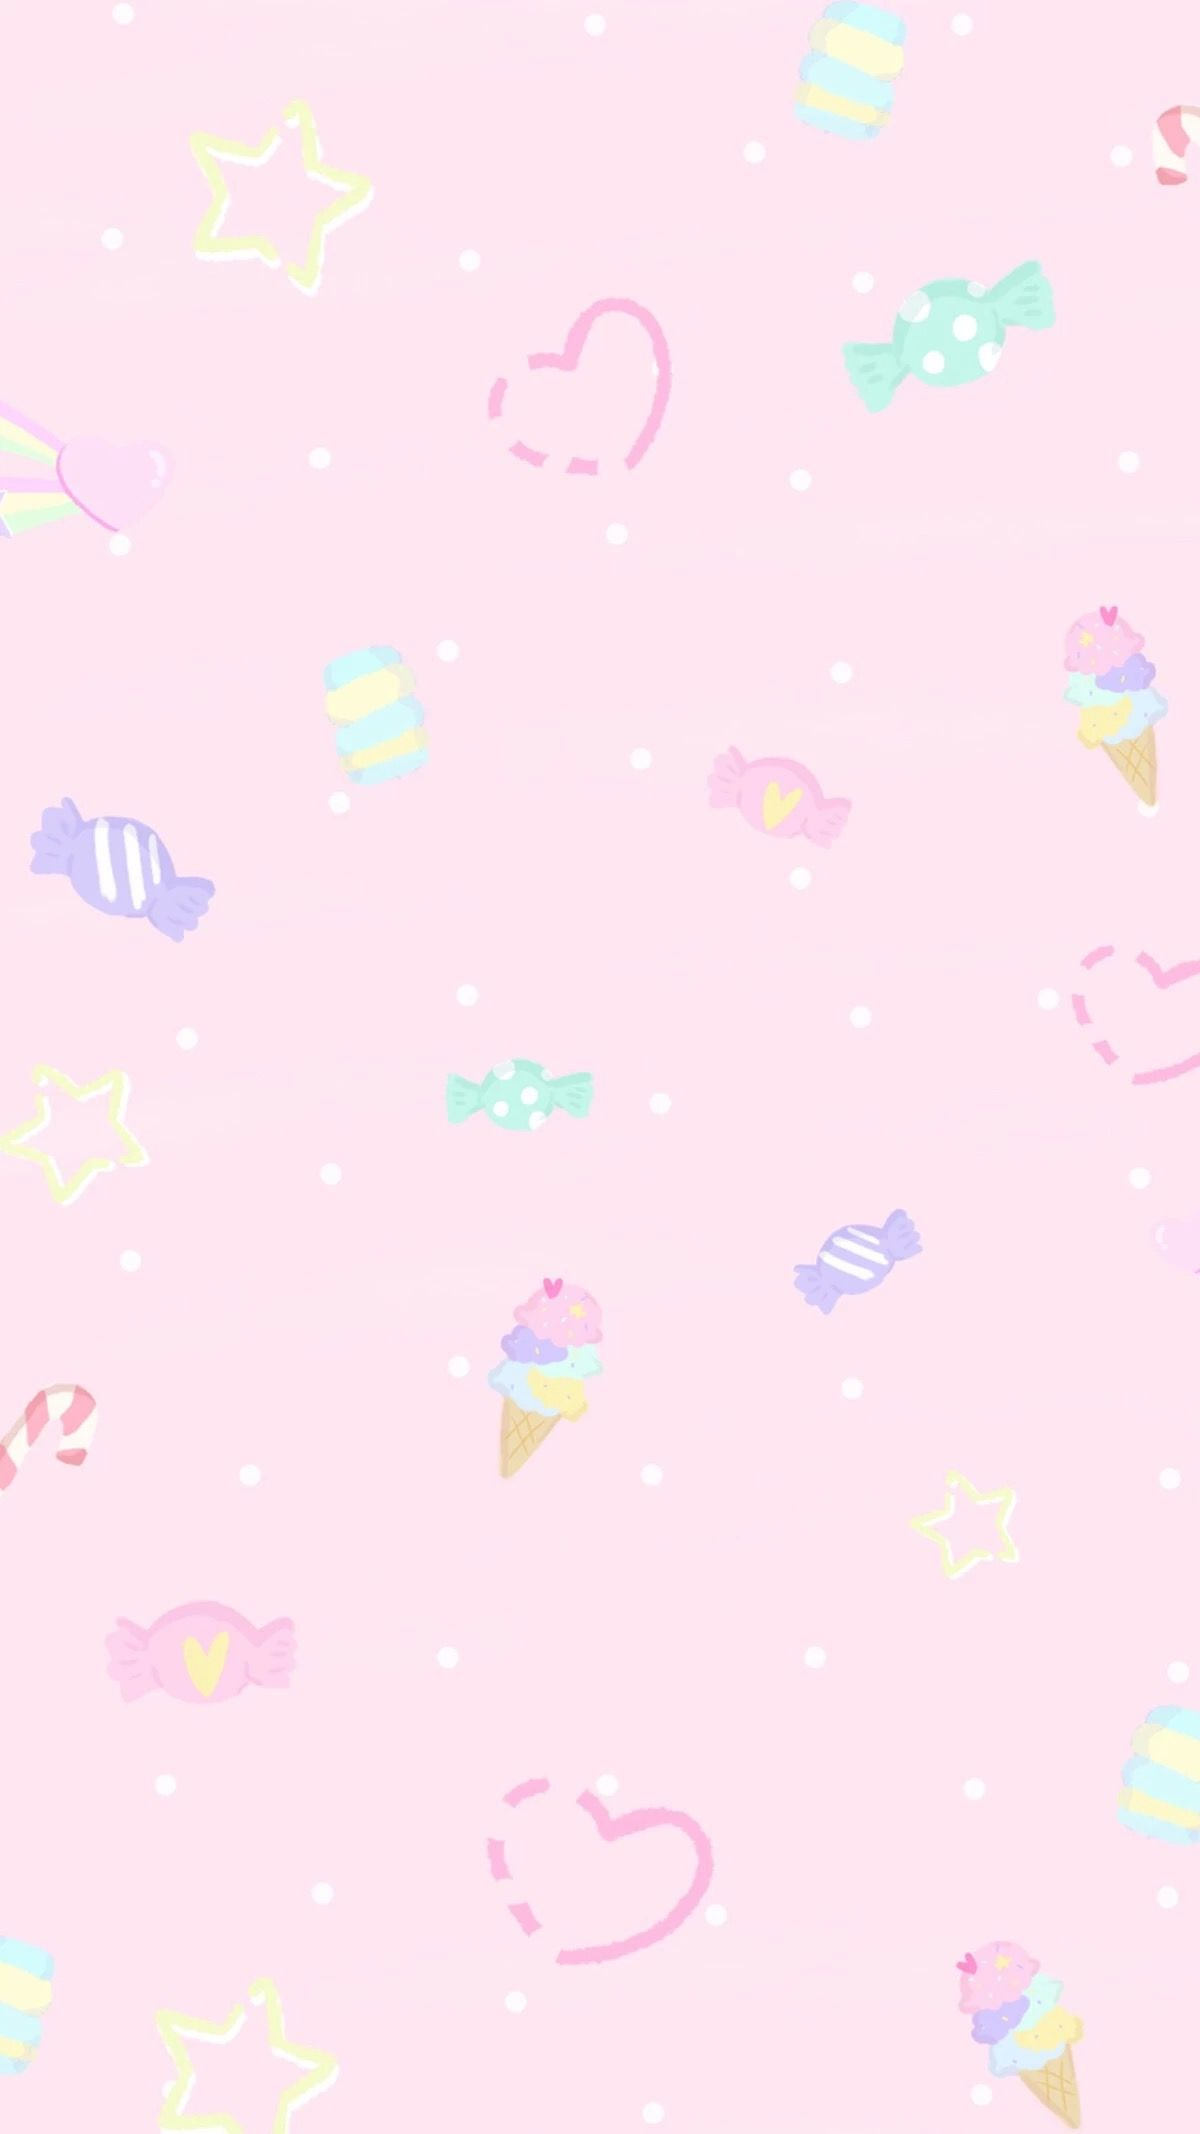 Kawaii pastel wallpapers top free kawaii pastel backgrounds wallpaperaccess - Pastel cute wallpaper ...